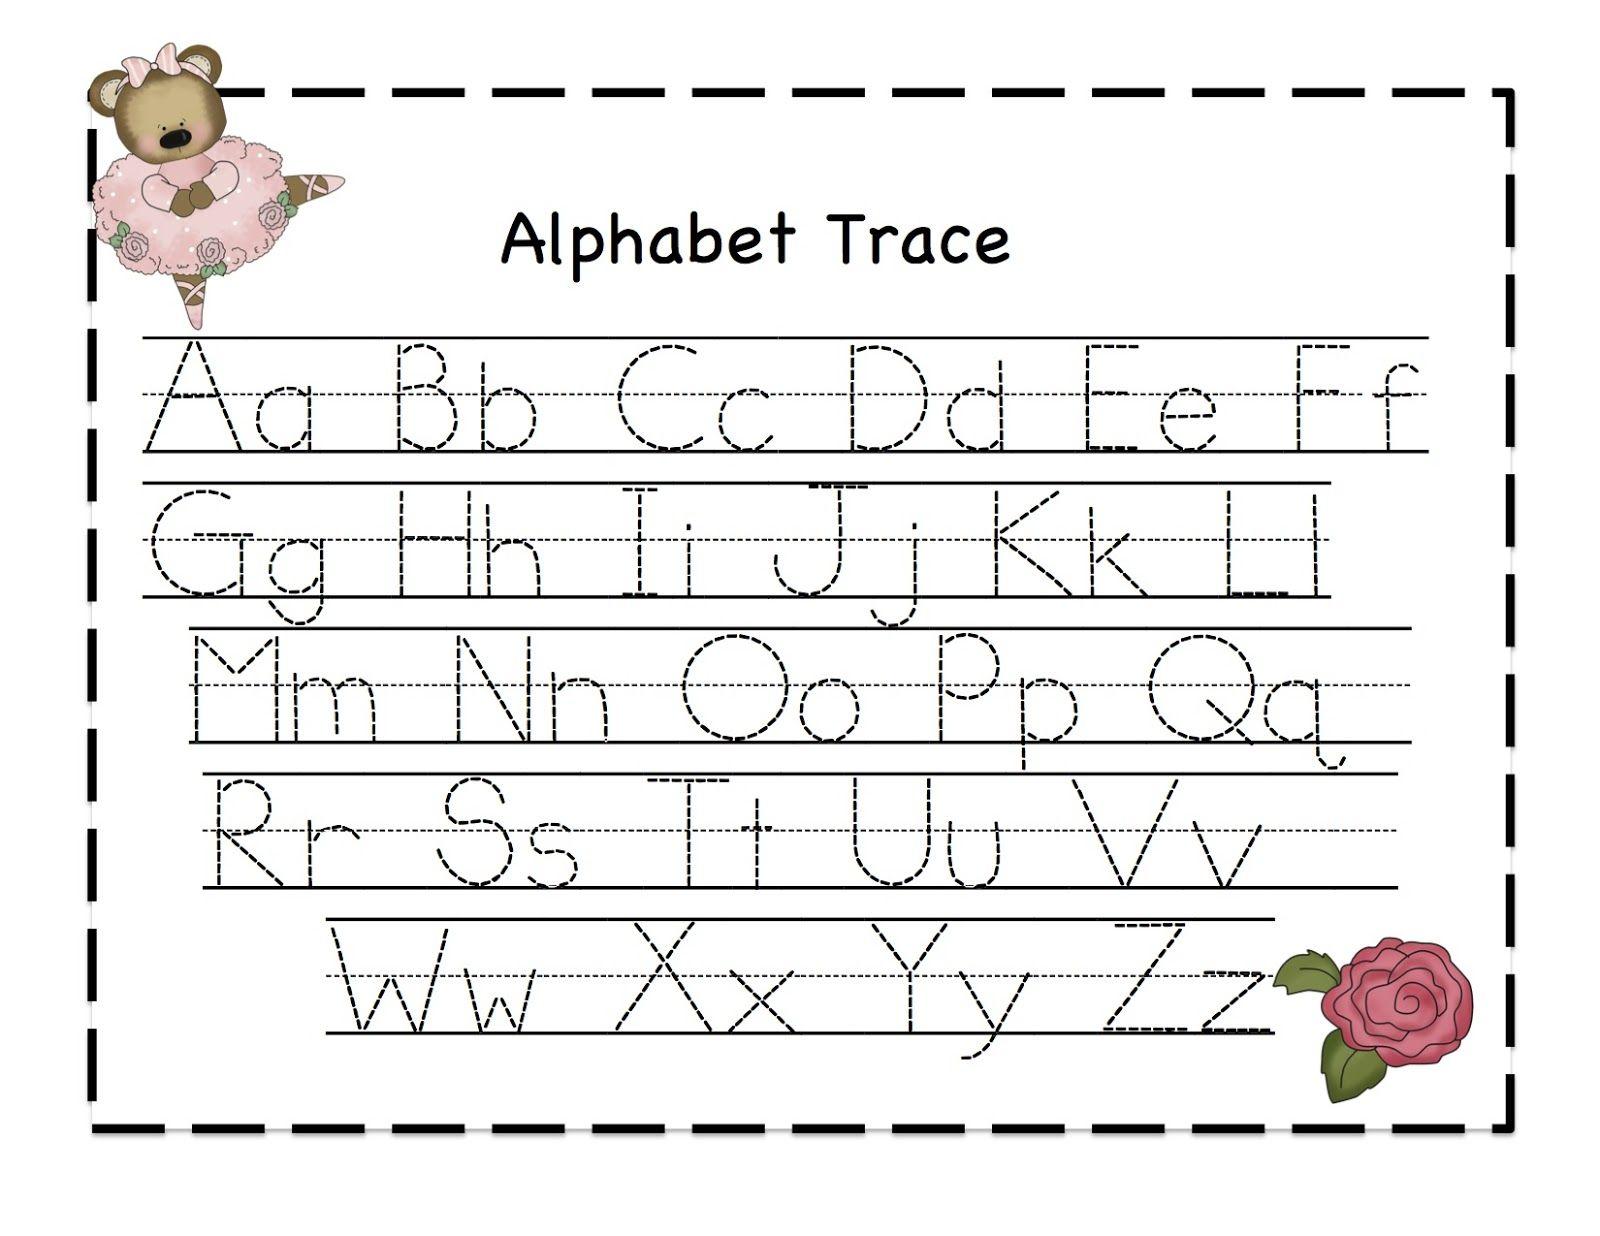 Preschool Printables Little Ballerina Bear Printable Printable Alphabet Worksheets Alphabet Worksheets Free Letter Tracing Worksheets [ 1236 x 1600 Pixel ]